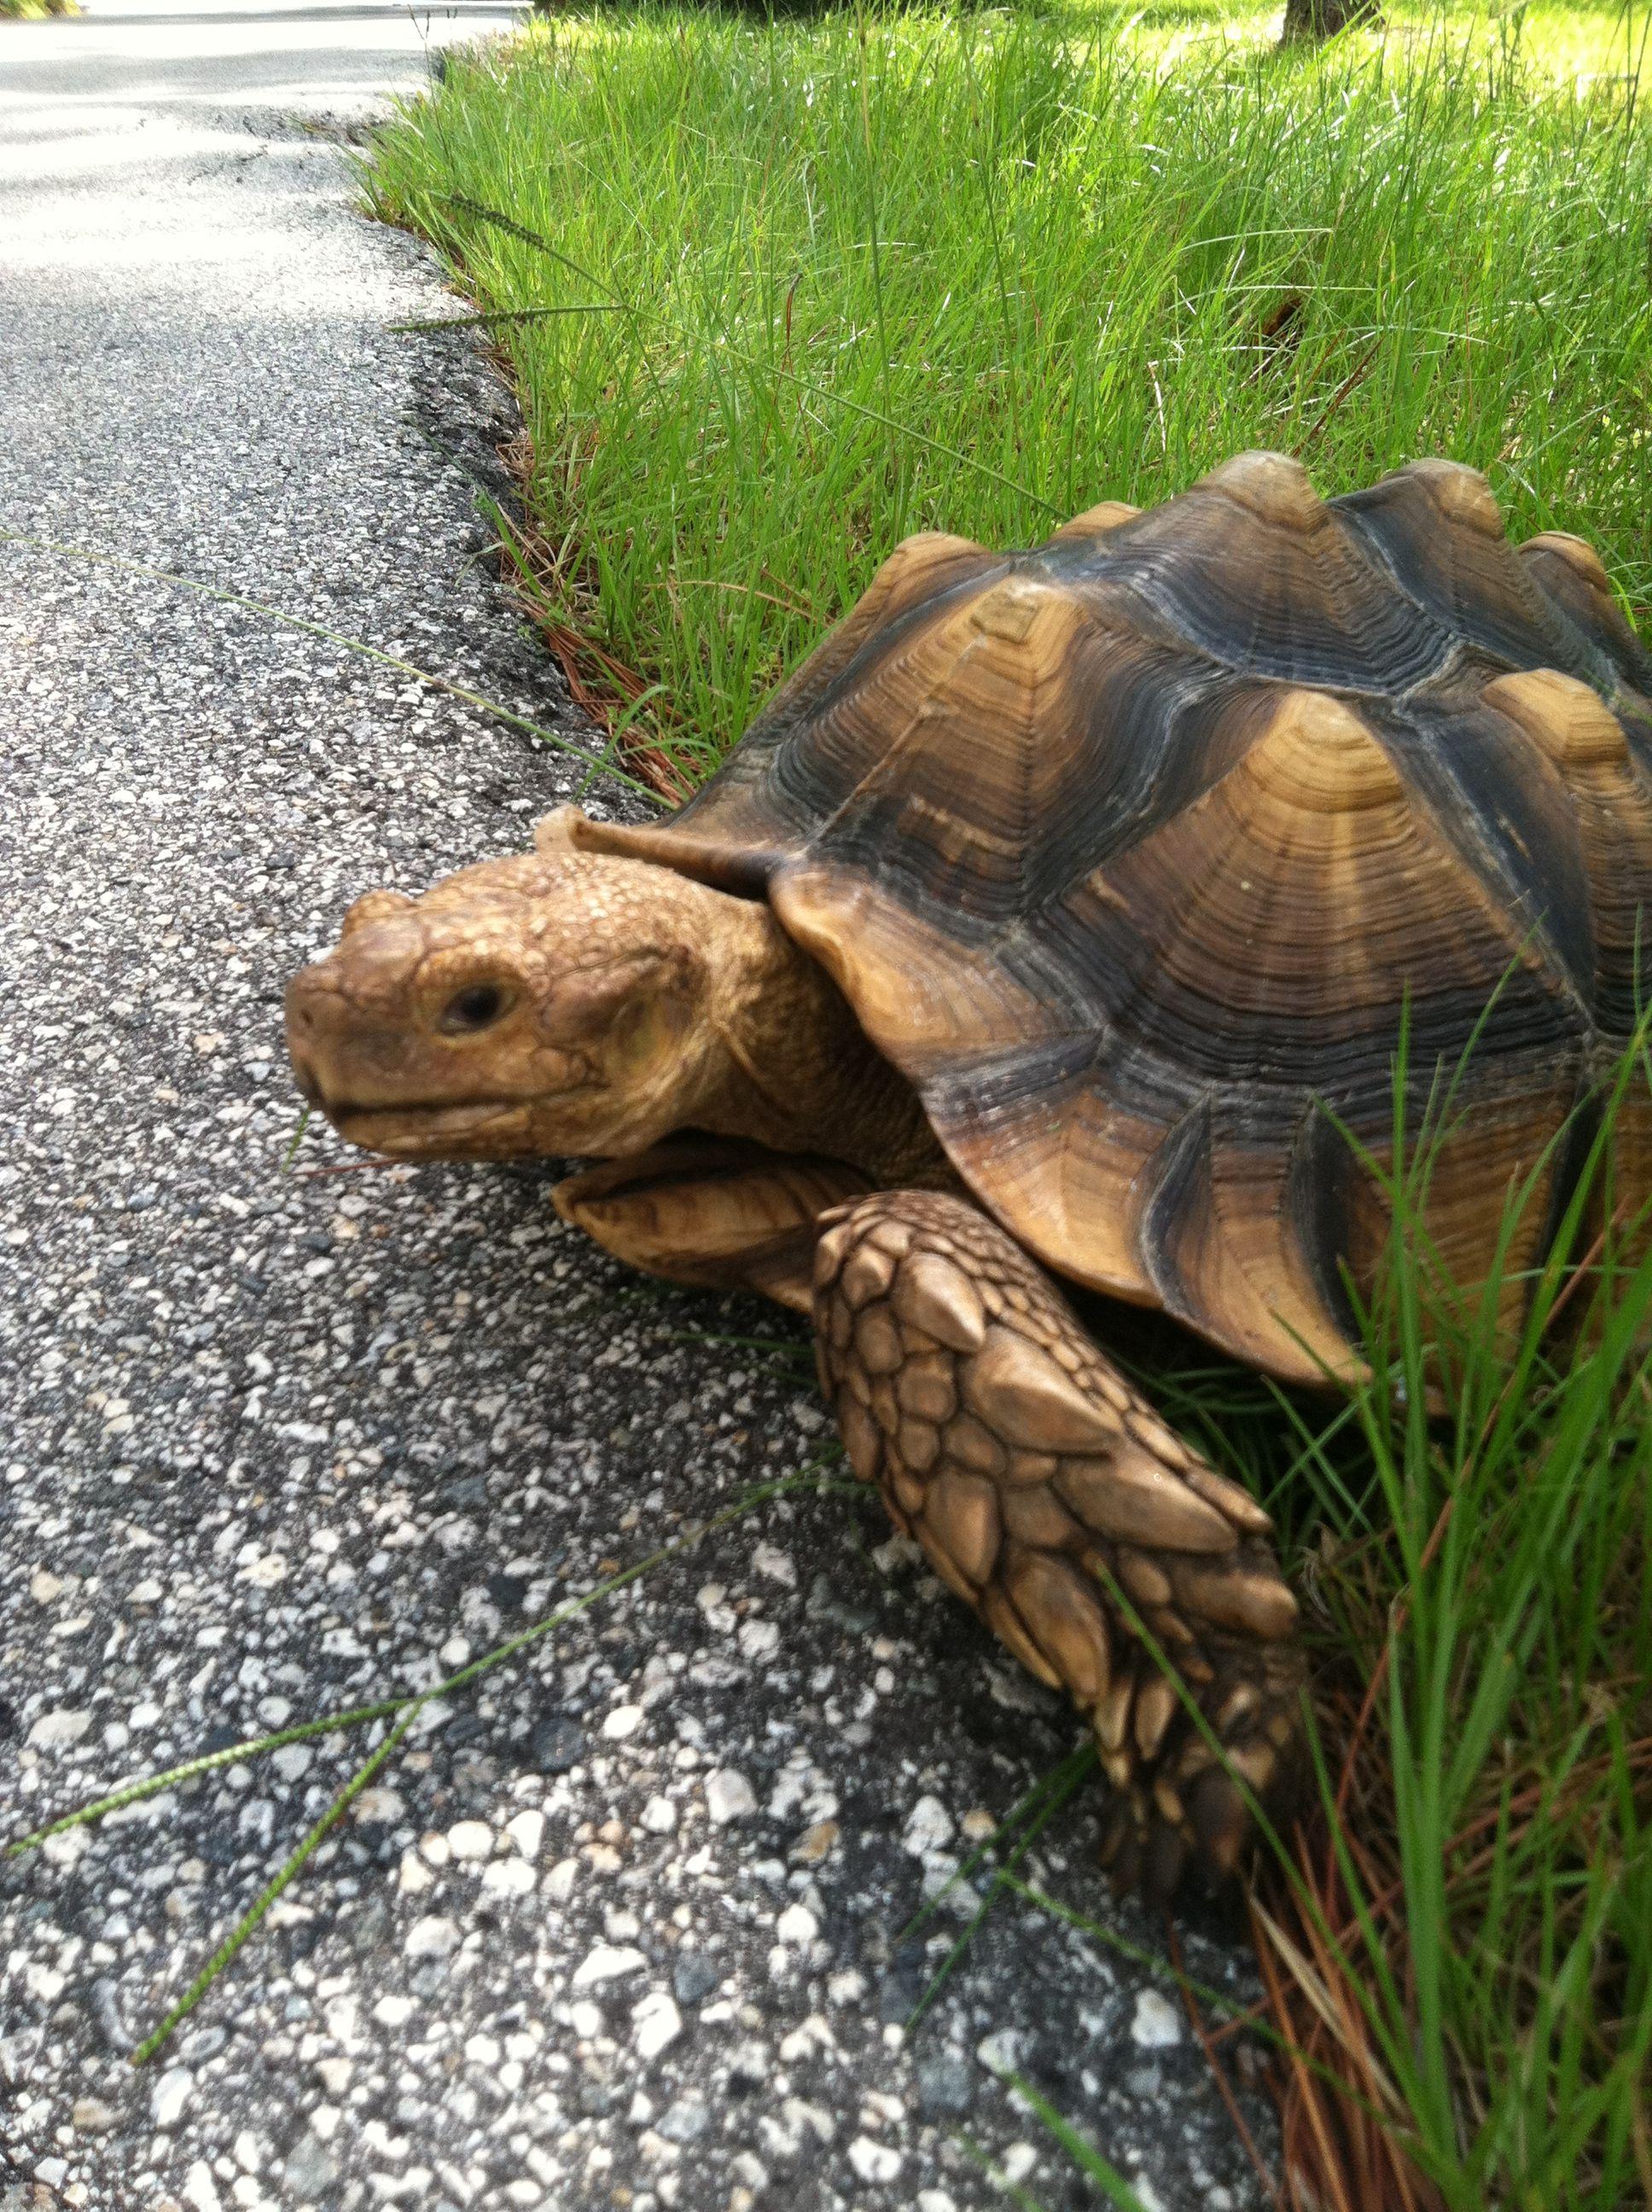 Rescue tortoise. Orlando, Florida Animals, Turtle, Tortoise